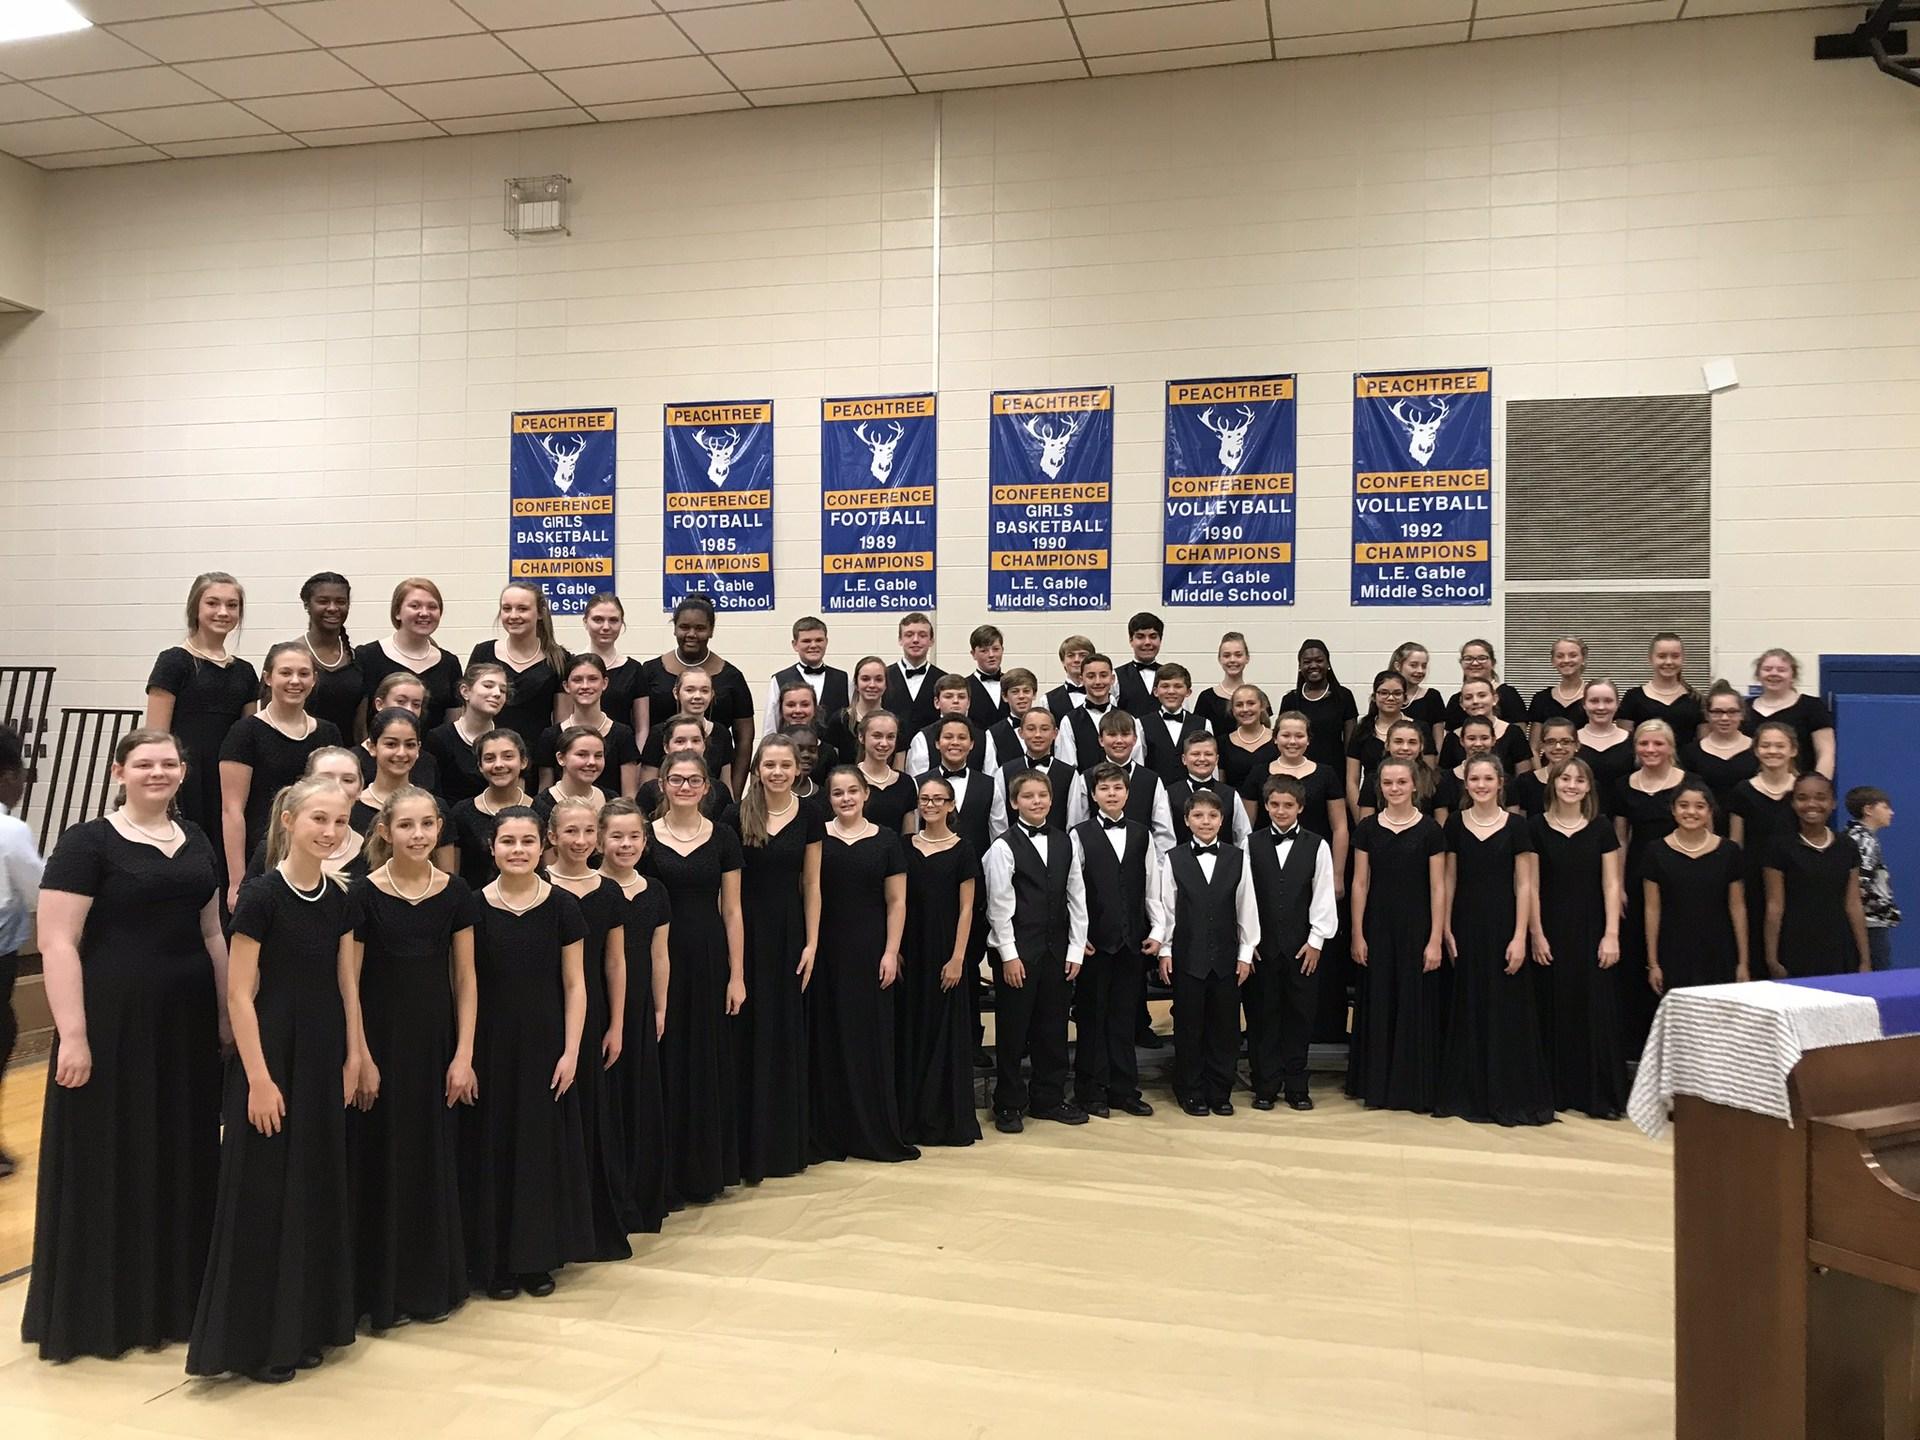 Gable Middle School Chorus